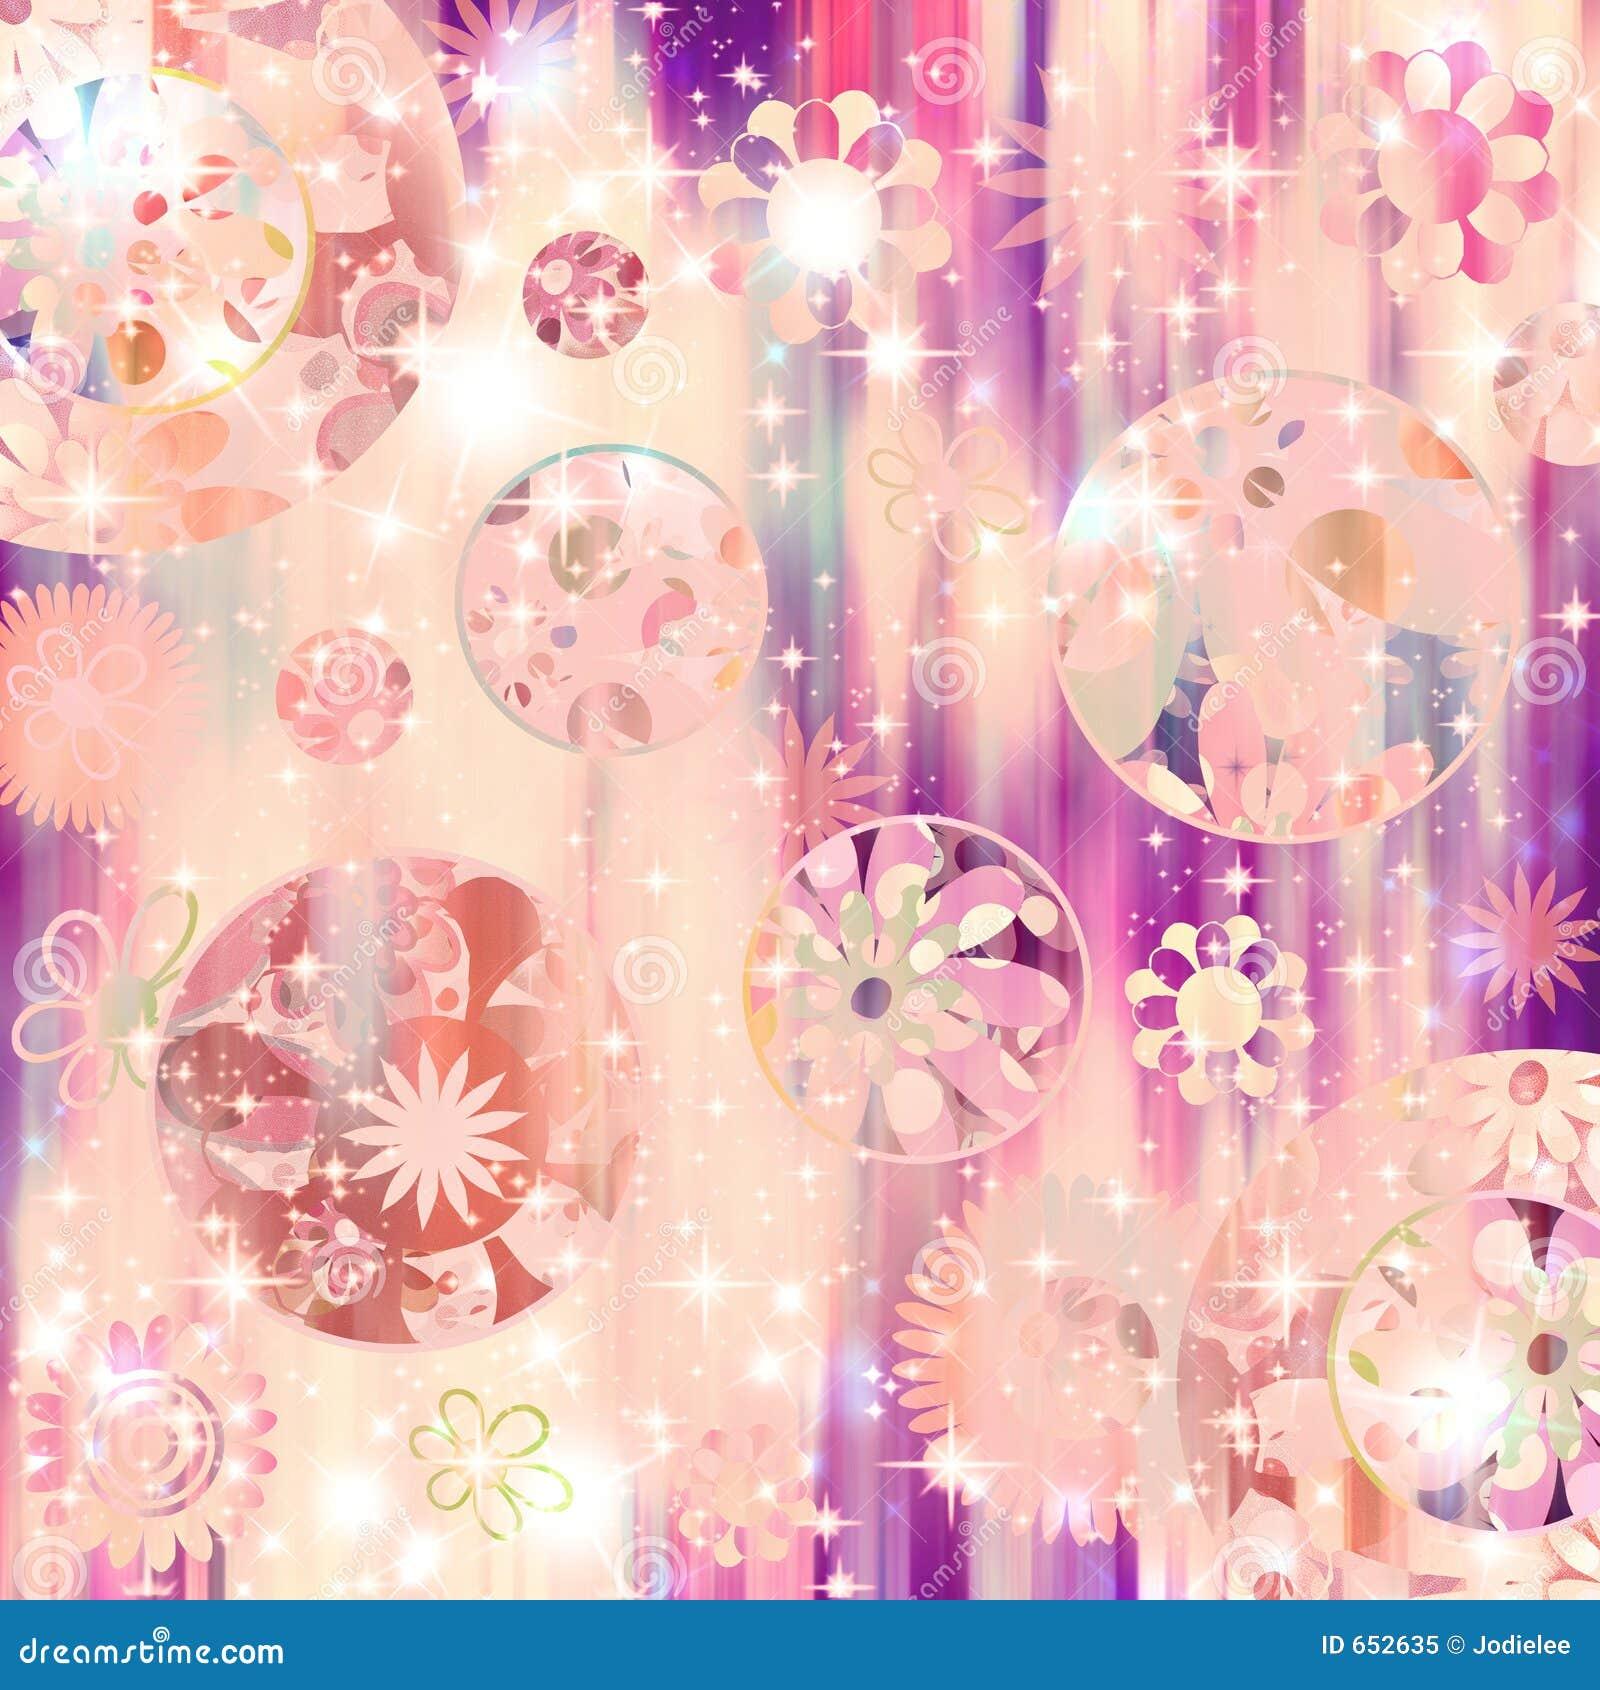 Sparkle Retro Flower Bling! Royalty Free Stock Photo - Image: 652635